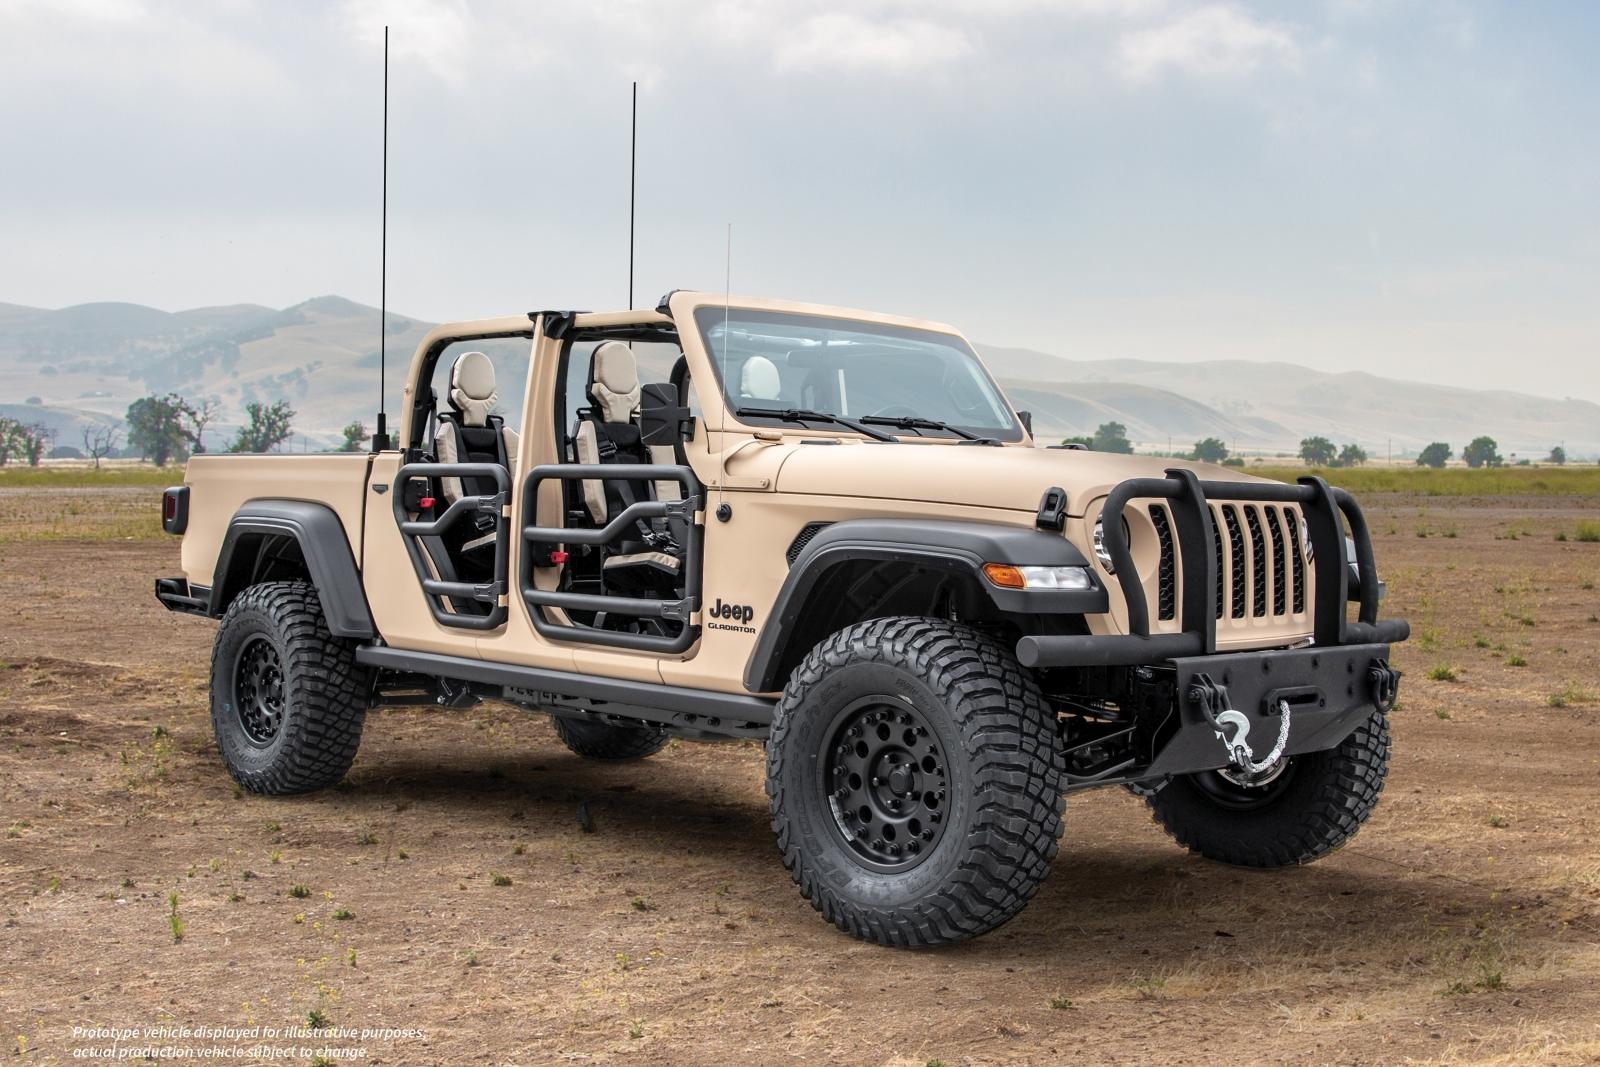 JeepGladiatorXMT7s0d3np0ca7mdi0os1te0sngvl